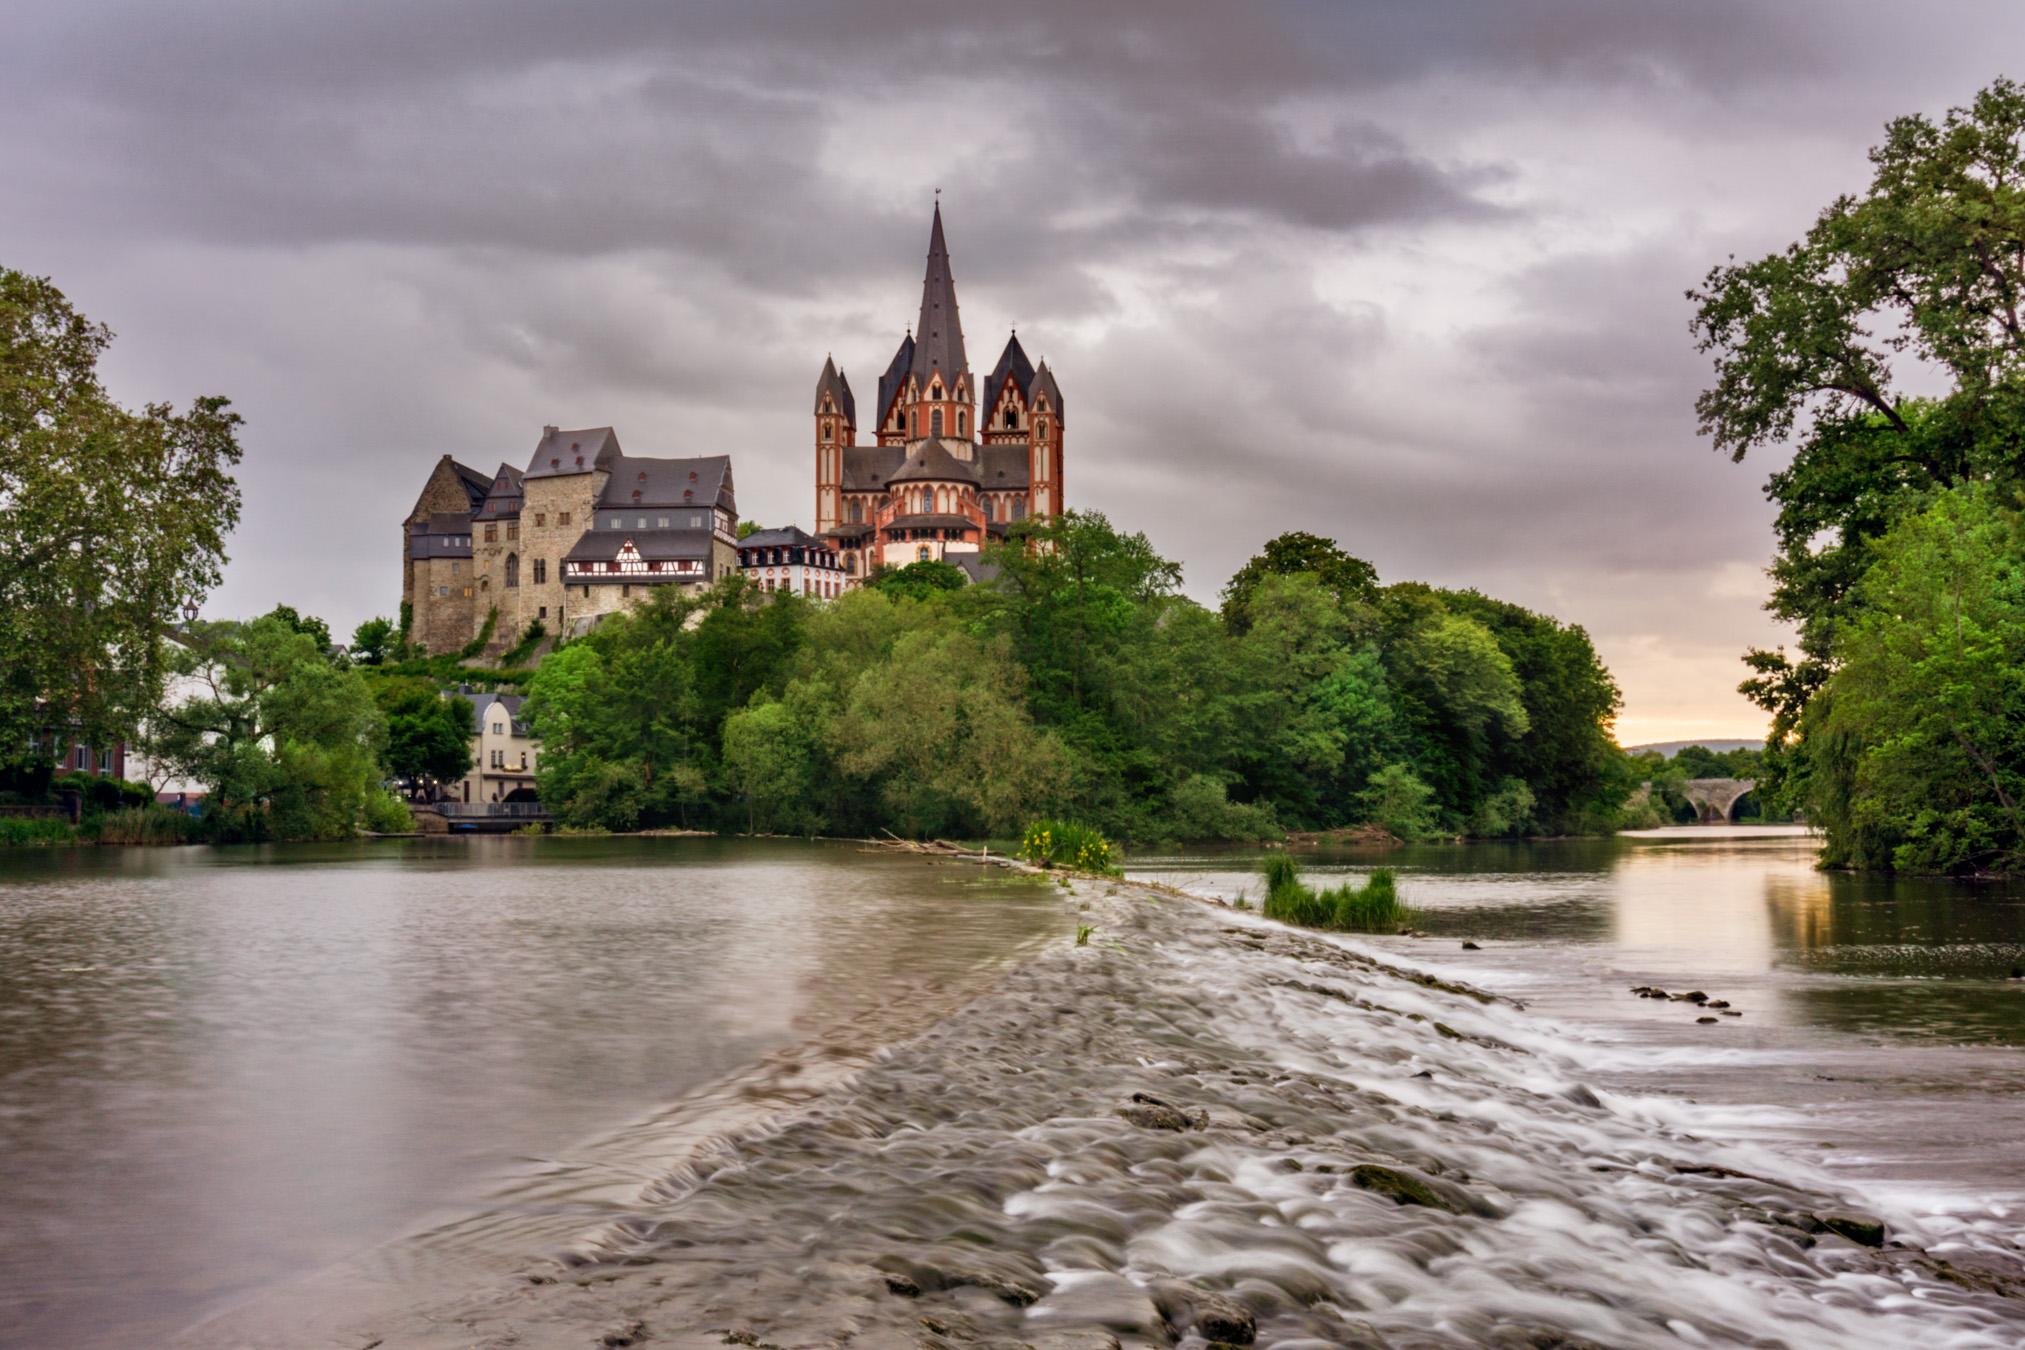 Schleuseninsel Limburg an der Lahn, Germany